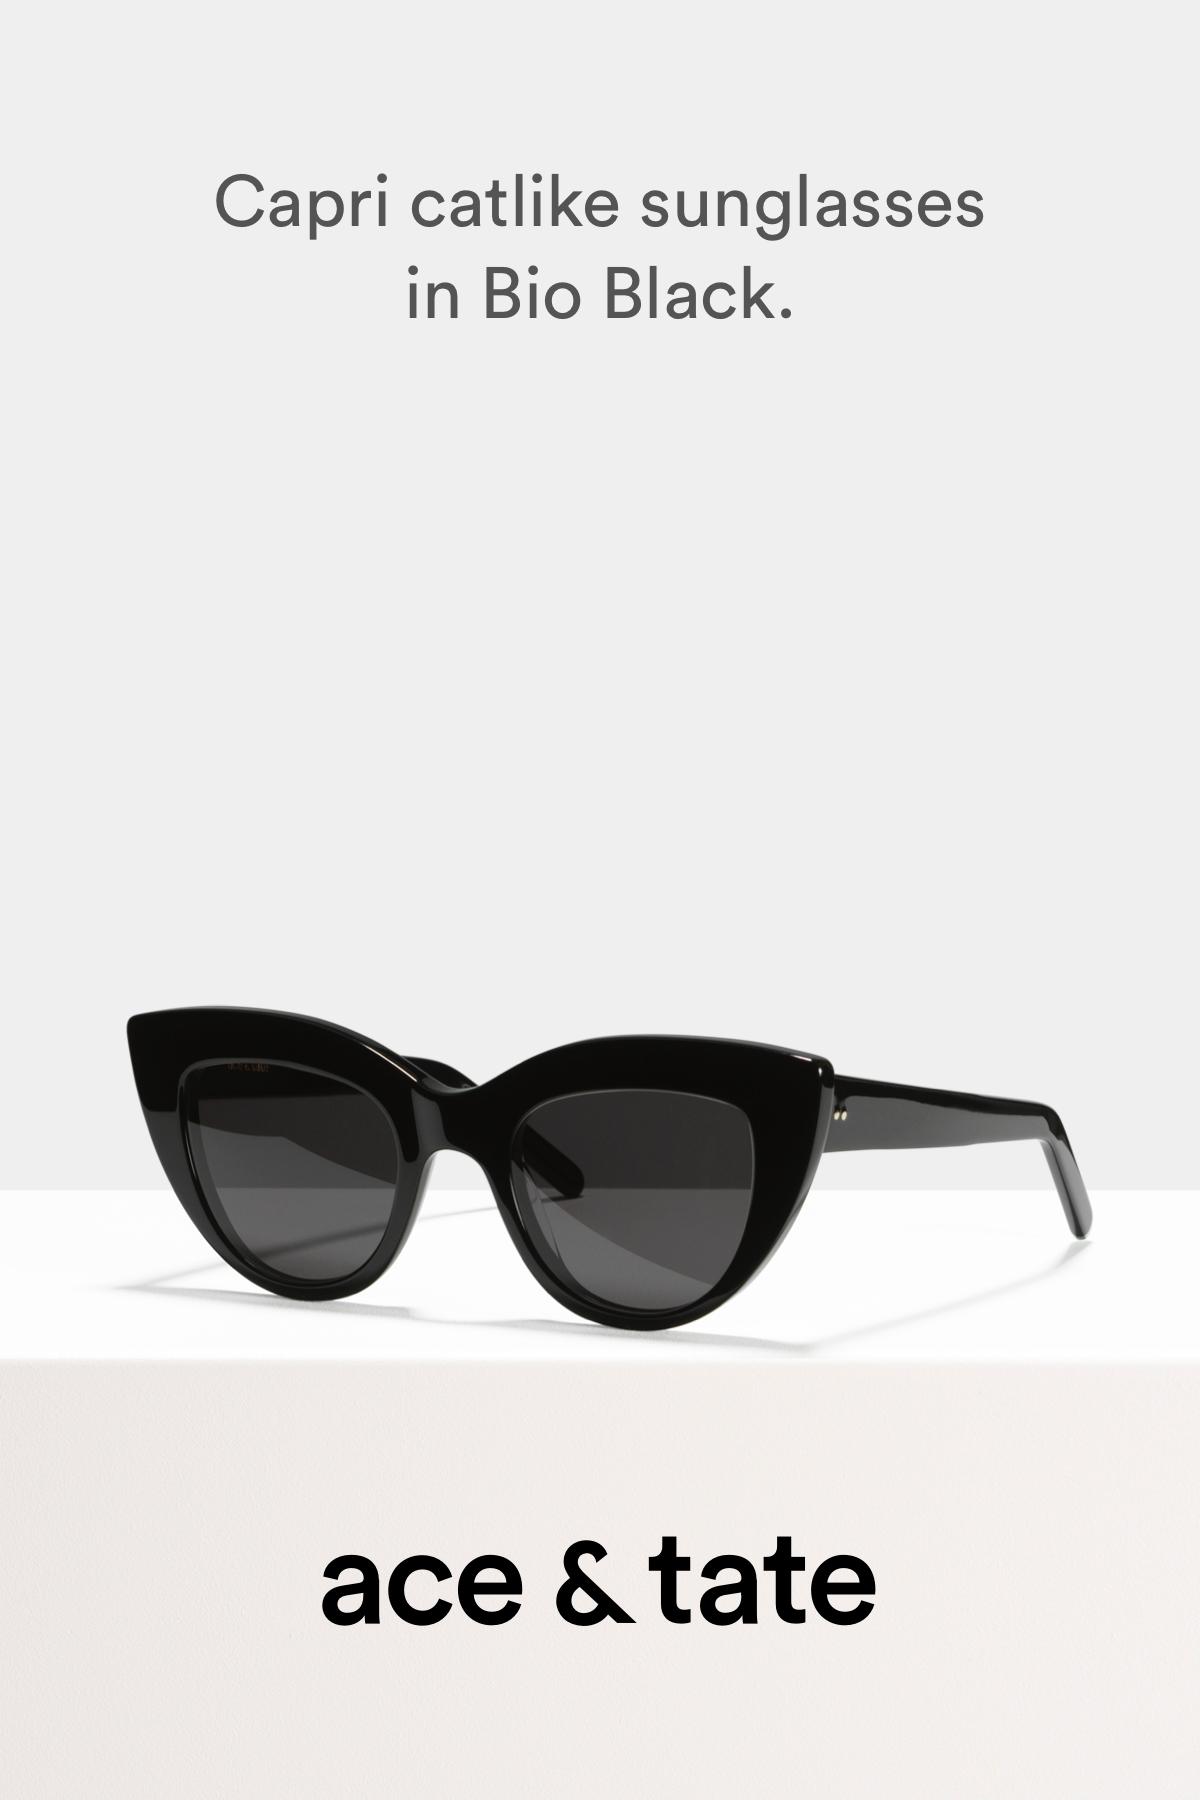 20e635ba9268 Capri - Catlike sunglasses - Black - View More | تزیینی in 2019 ...